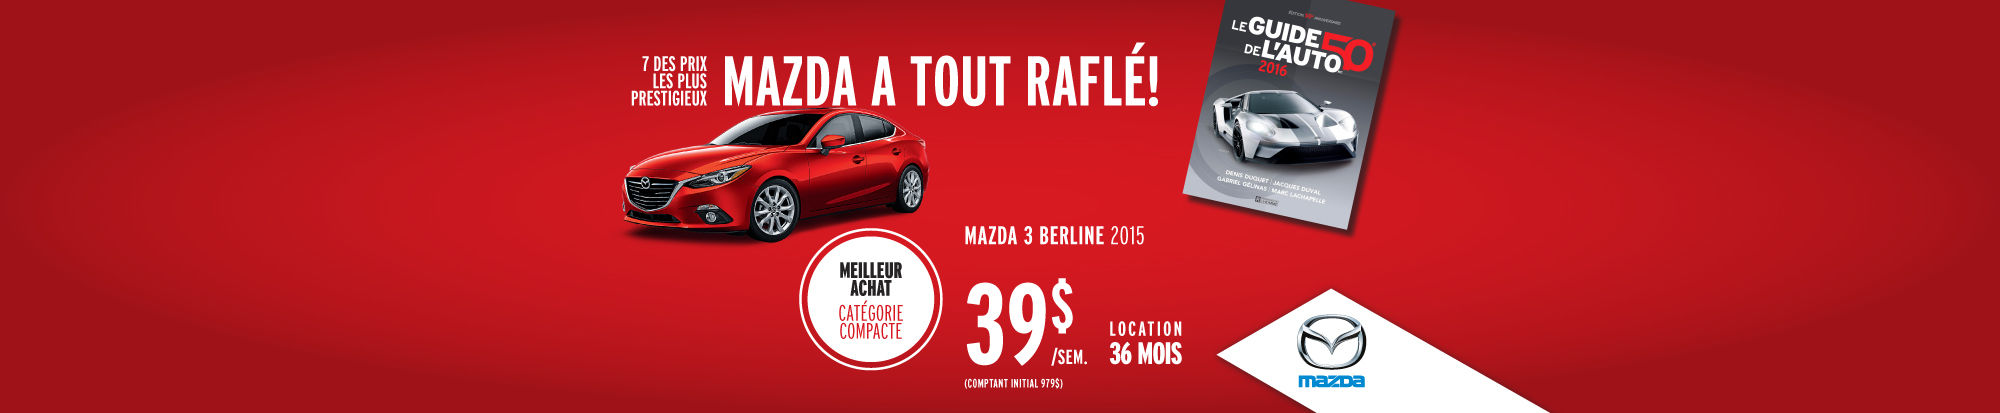 Véhicules de l'année Mazda 3 berline